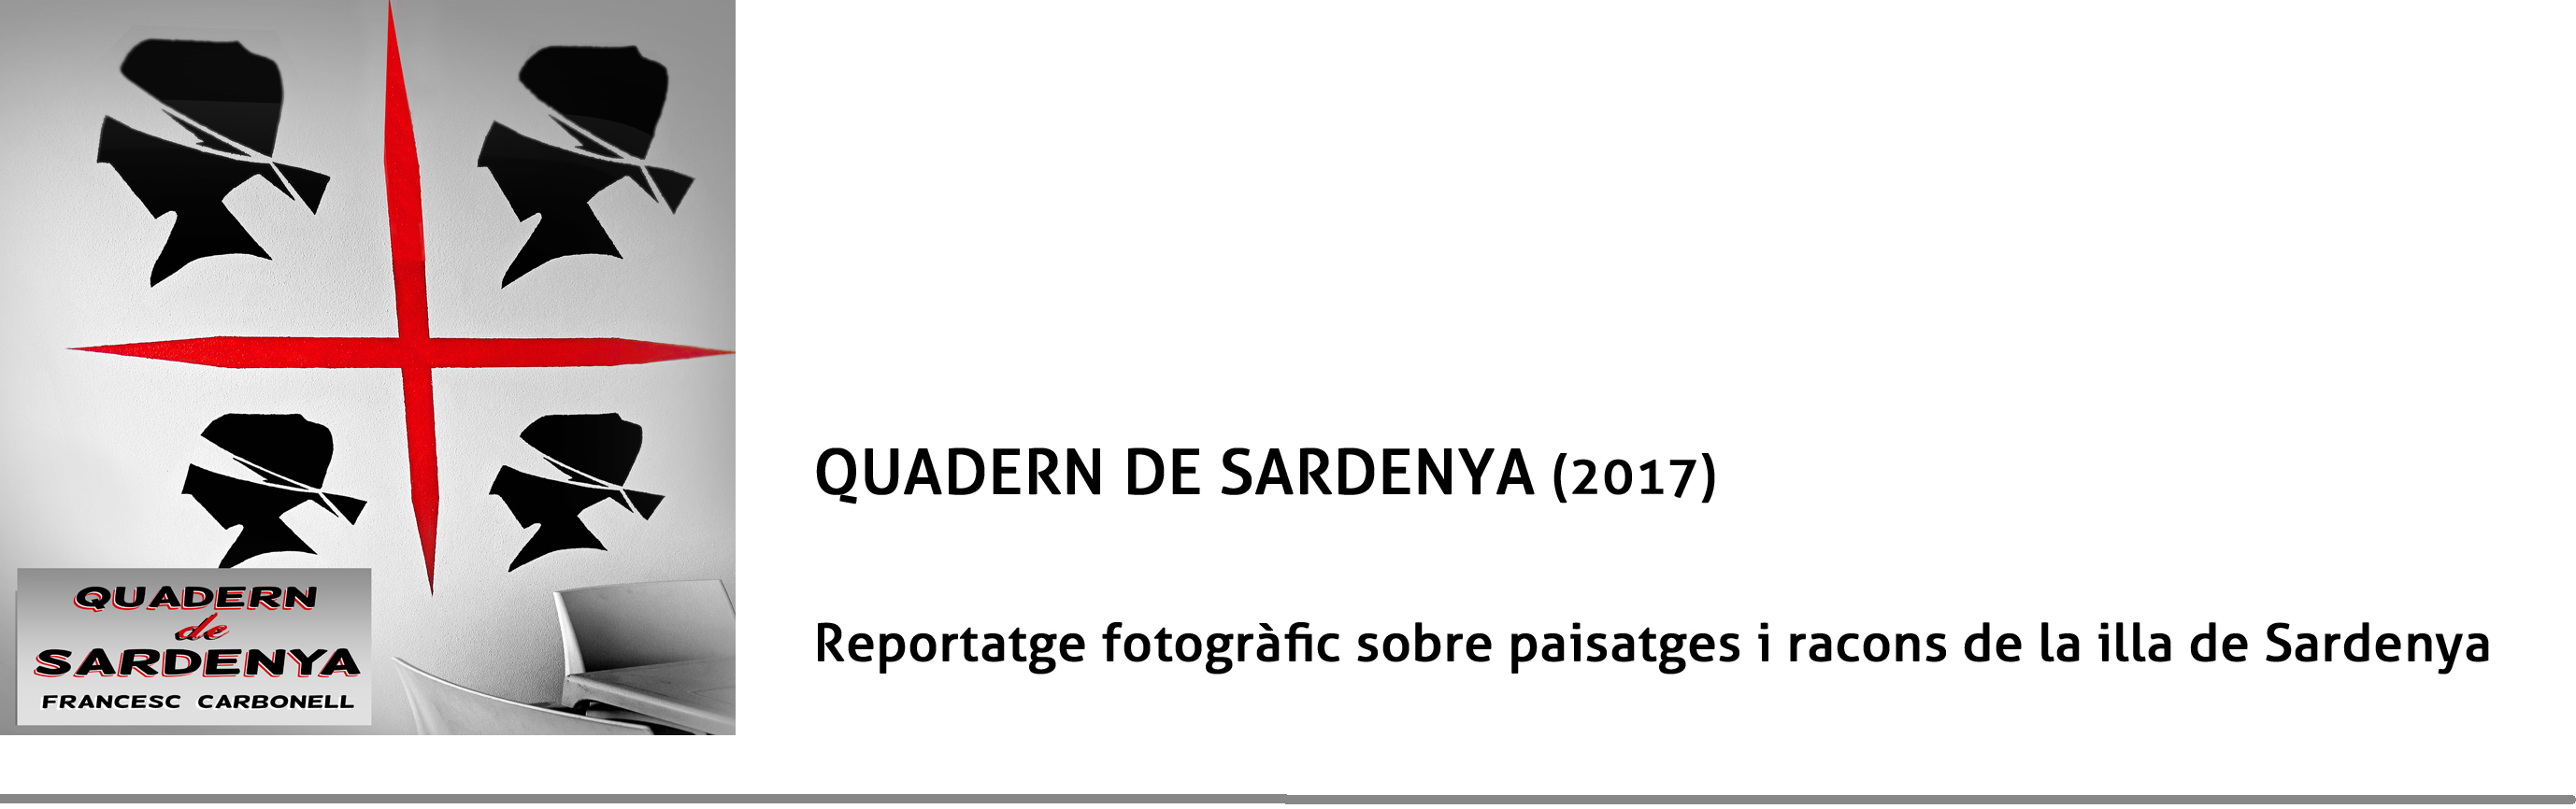 sardenya